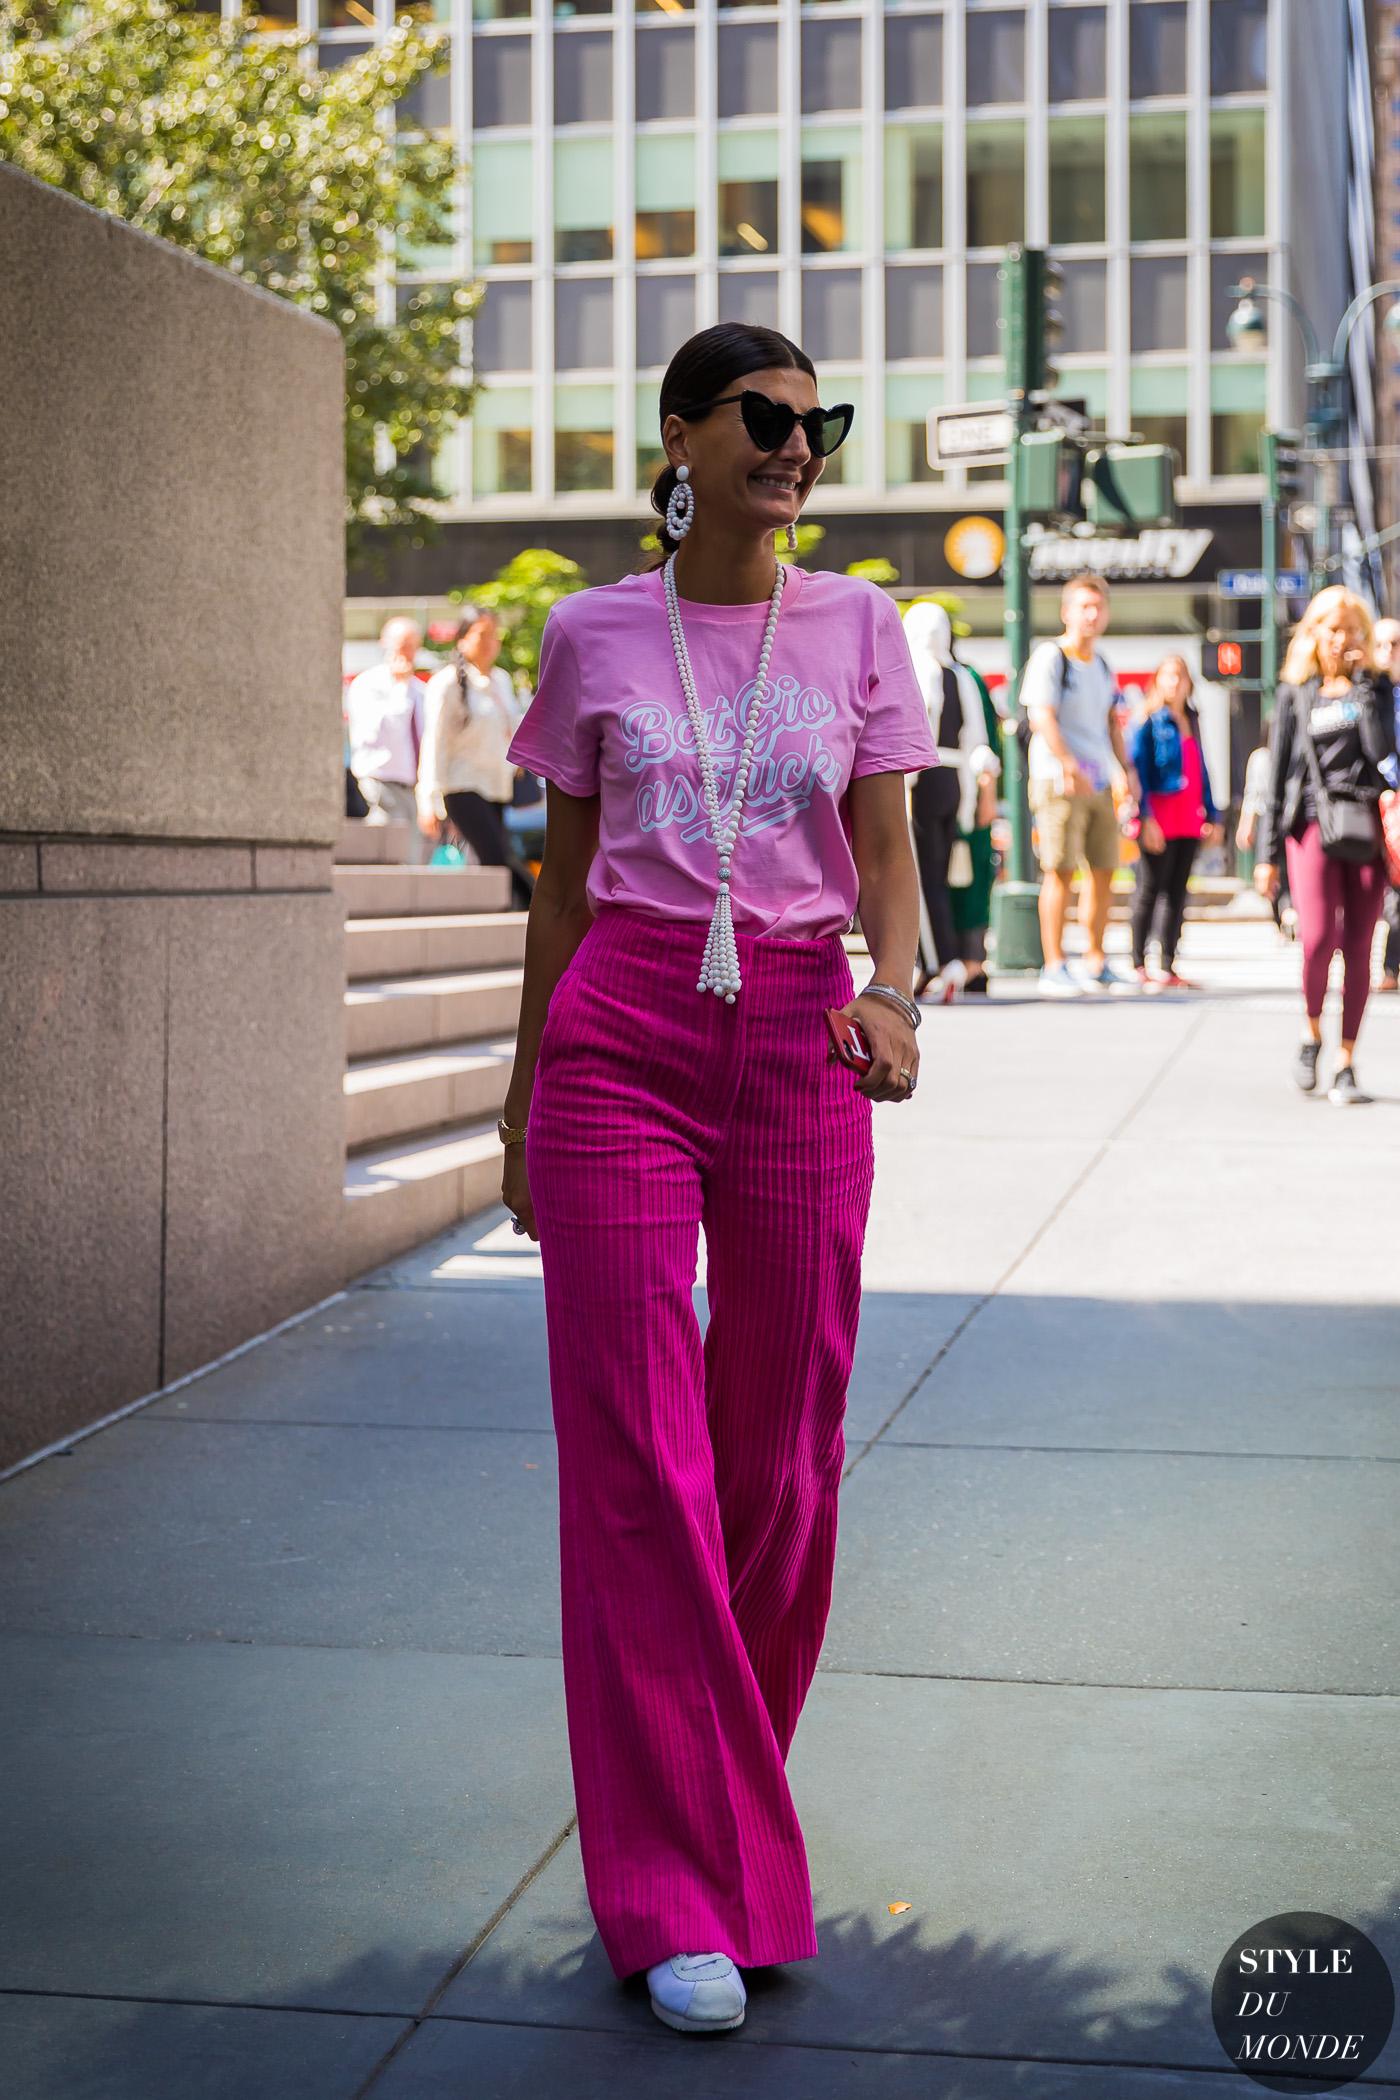 Giovanna Engelbert Battaglia by STYLEDUMONDE Street Style Fashion Photography_48A8493